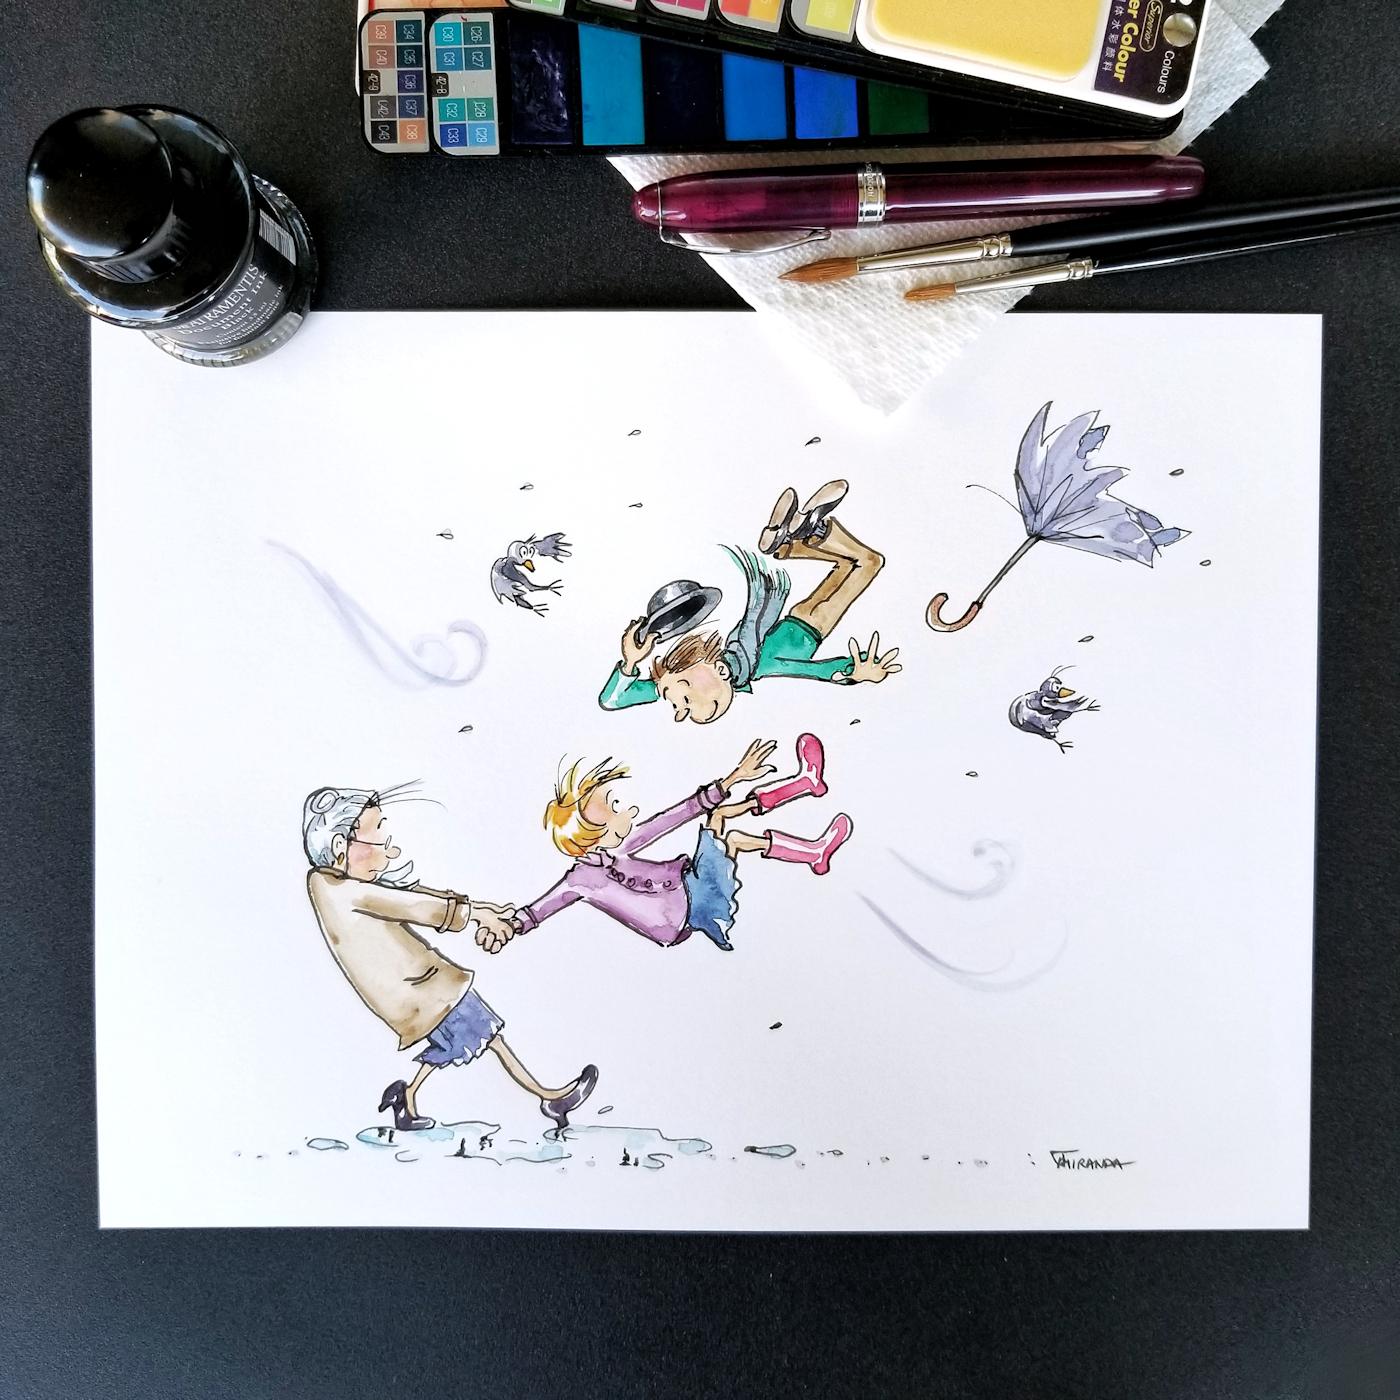 JMSC-180 Blustery photo of original illustration by Joana Miranda